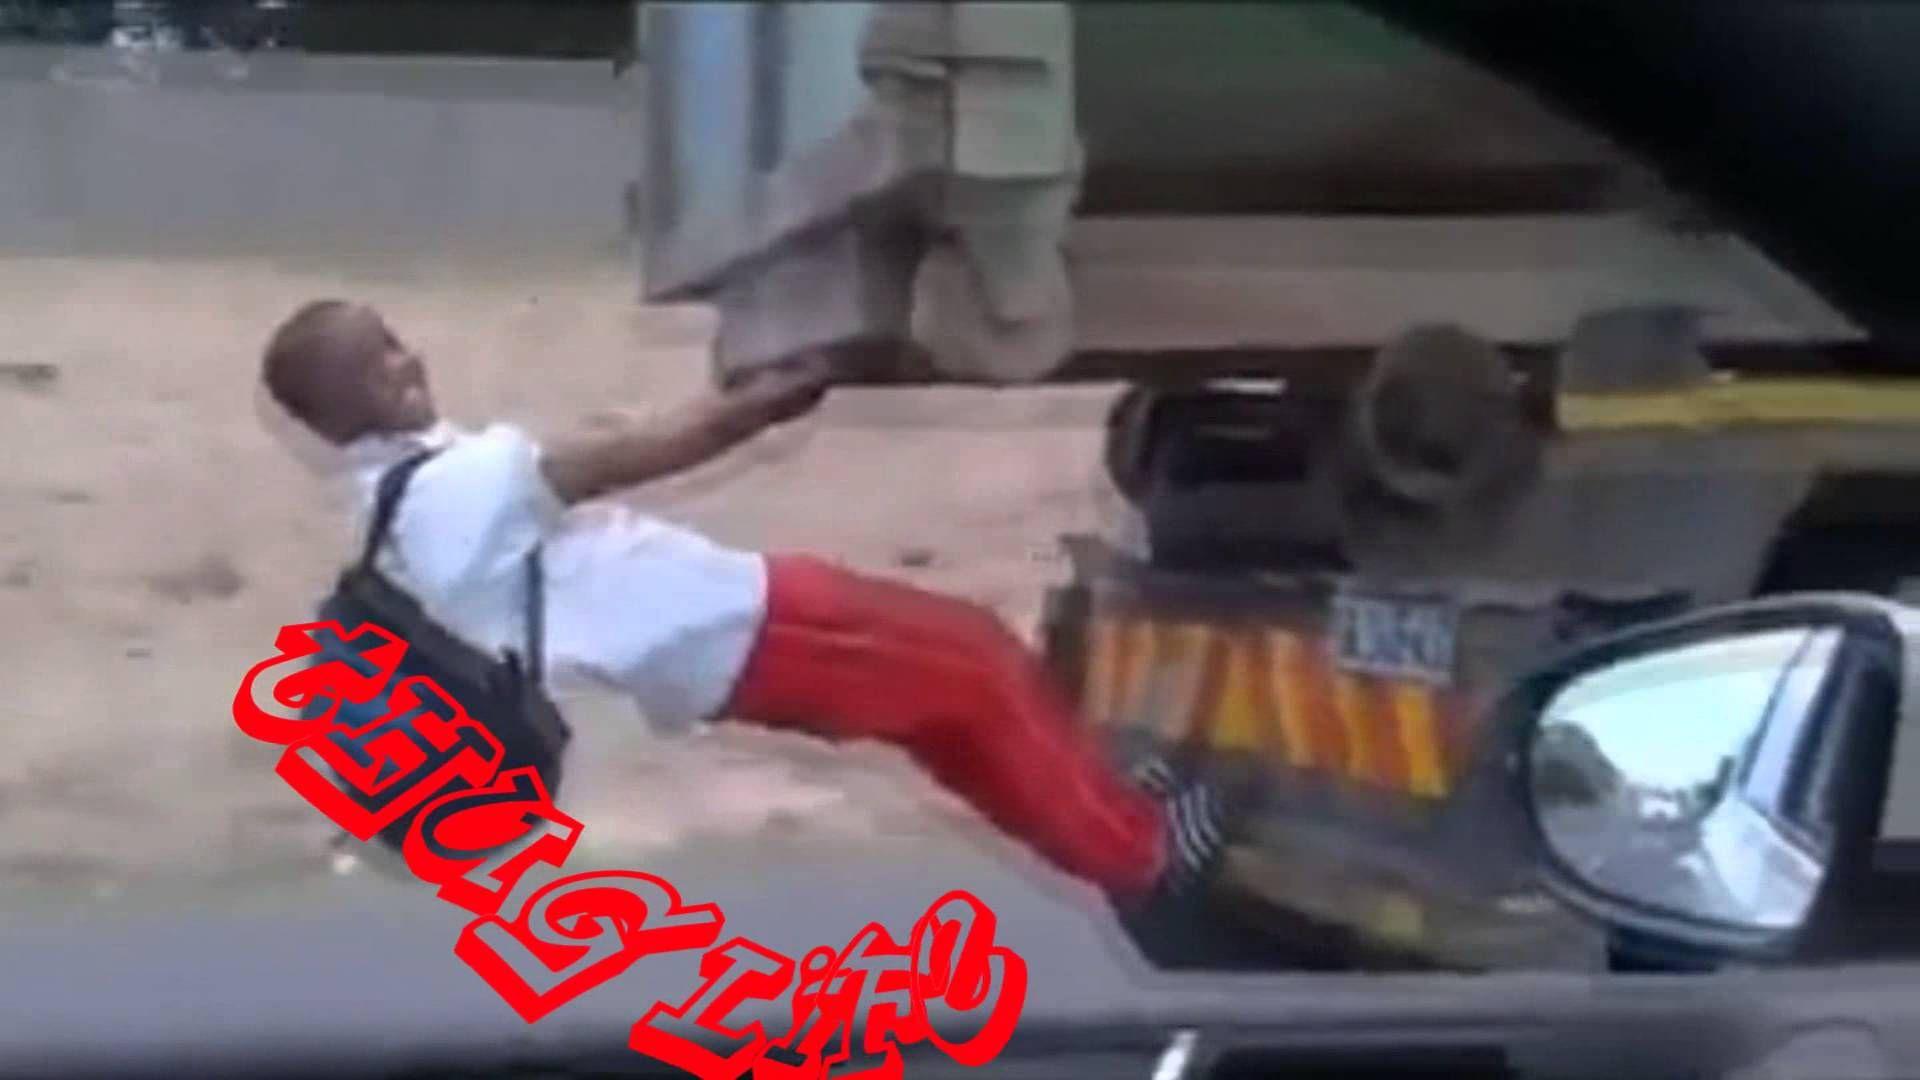 Ridin Dirty Funny Meme : Thug life true definition of ridin dirty thug life